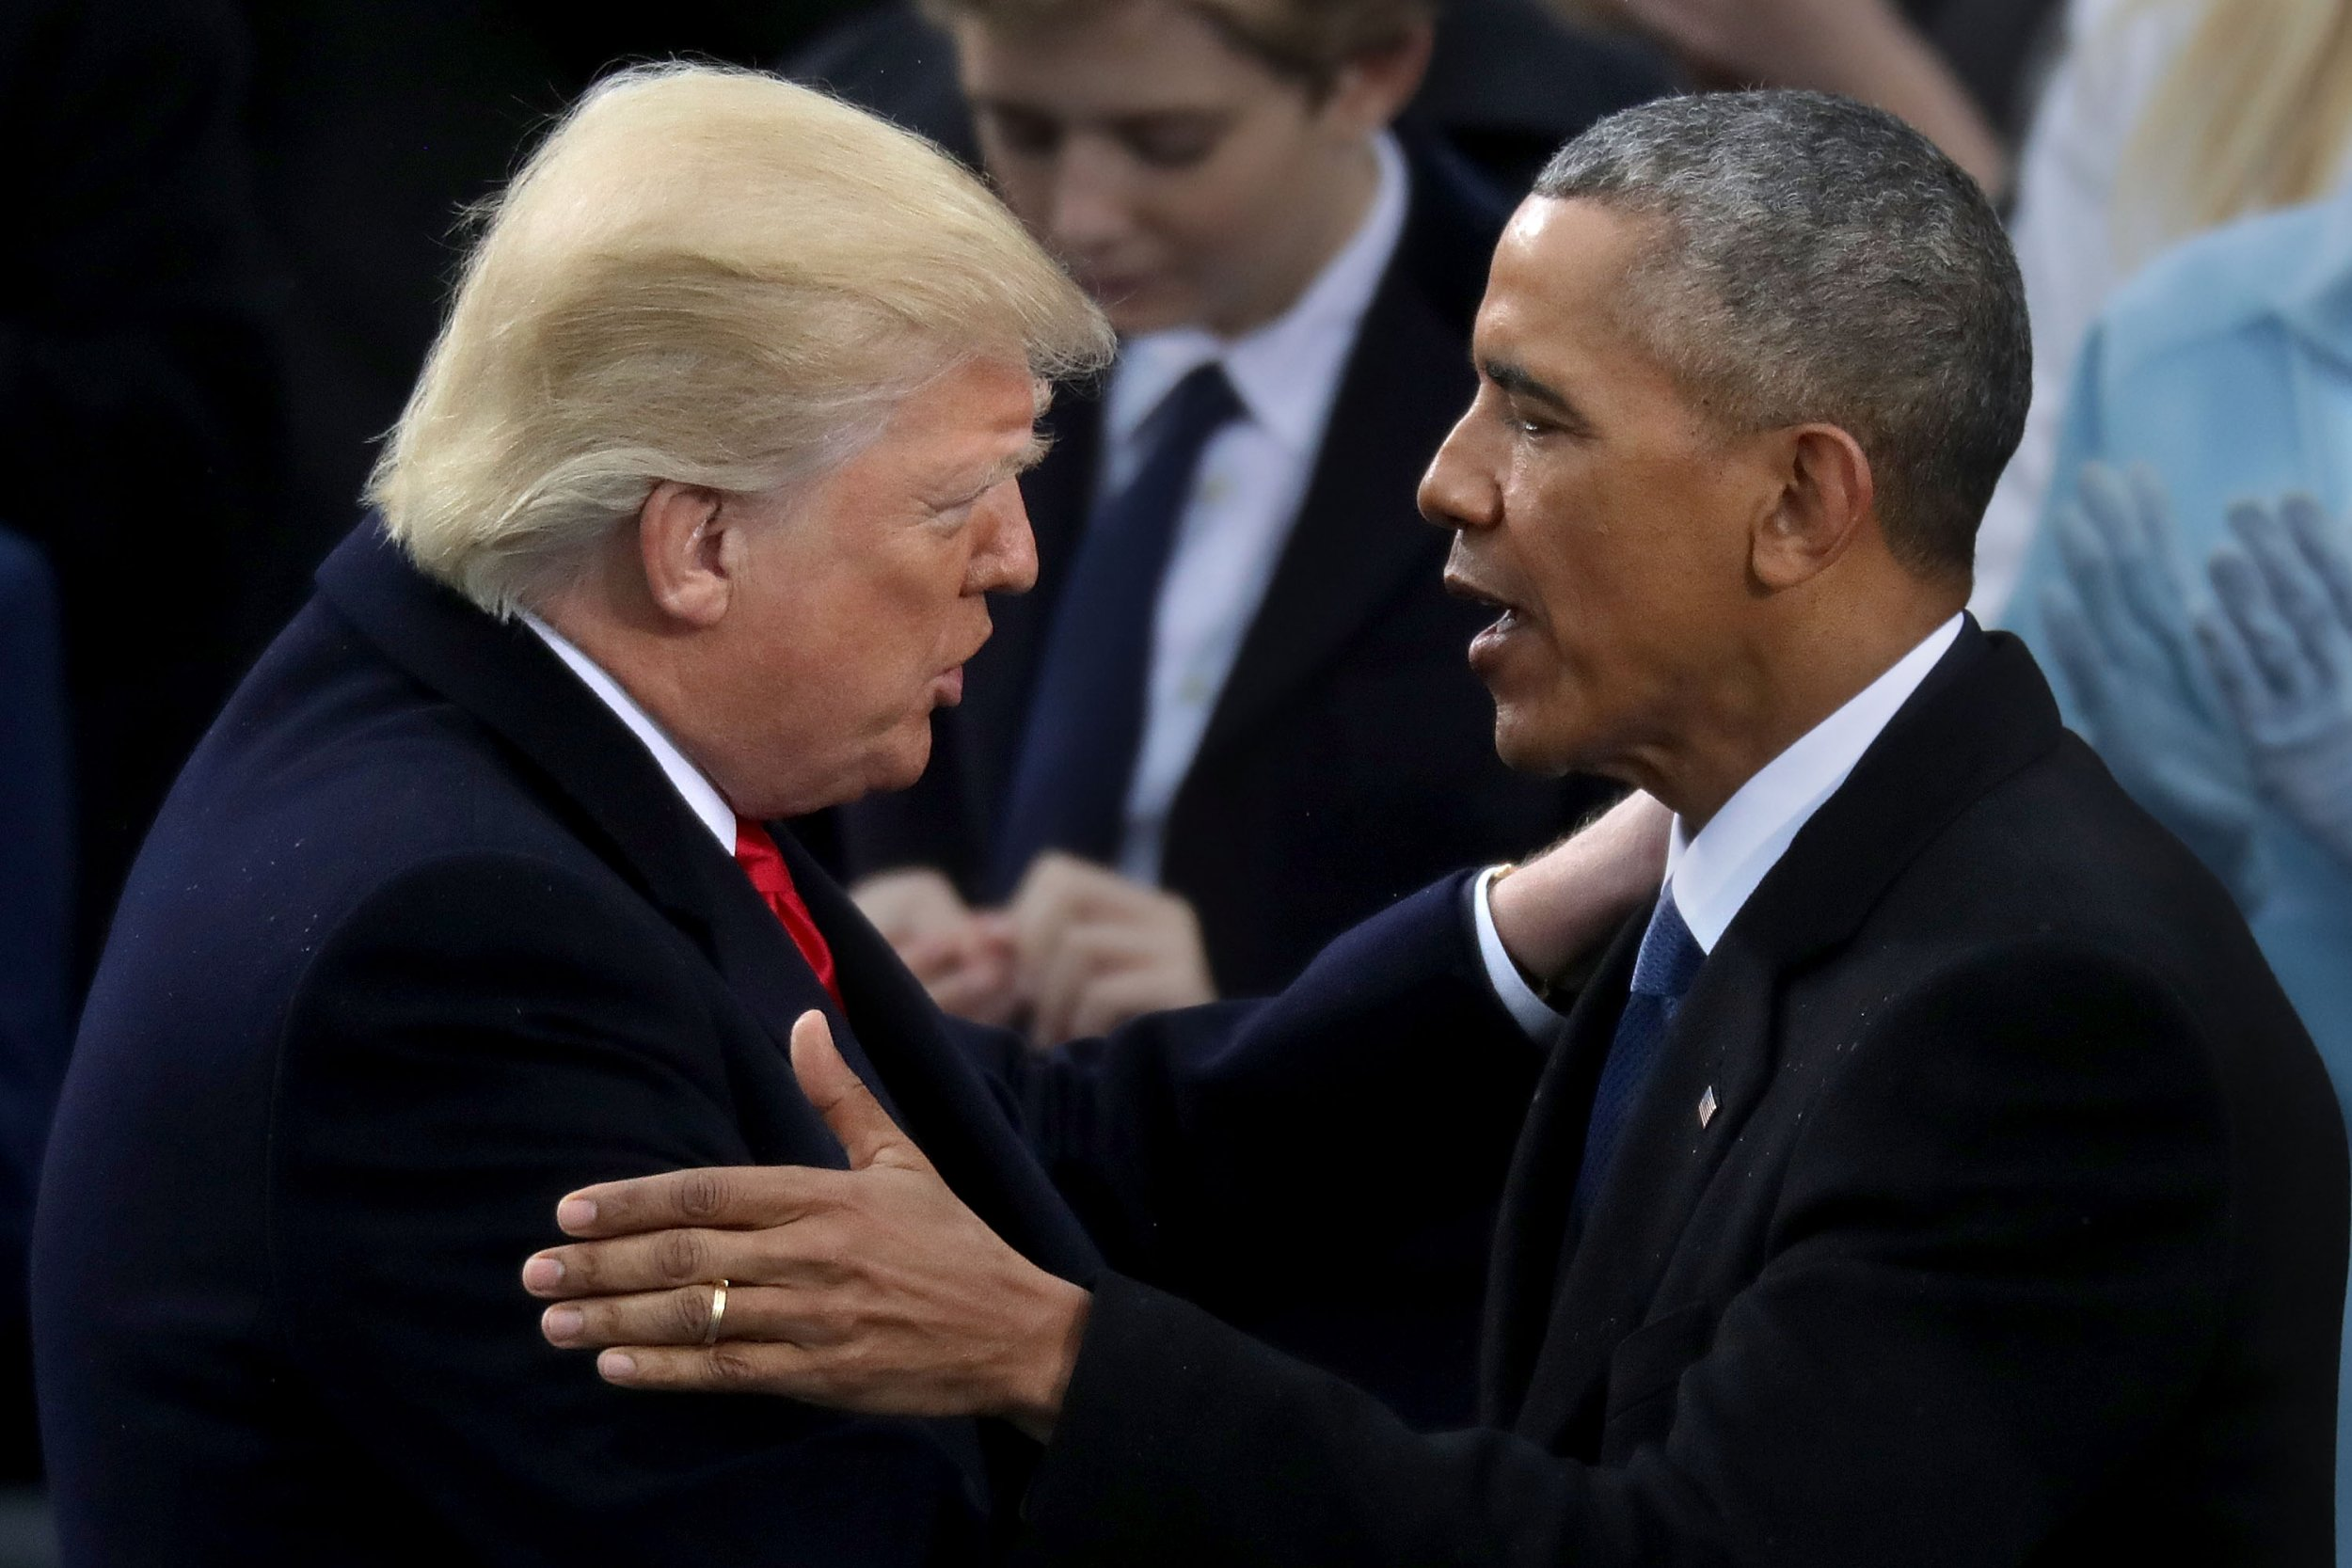 donald trump, brarack obama, stock market